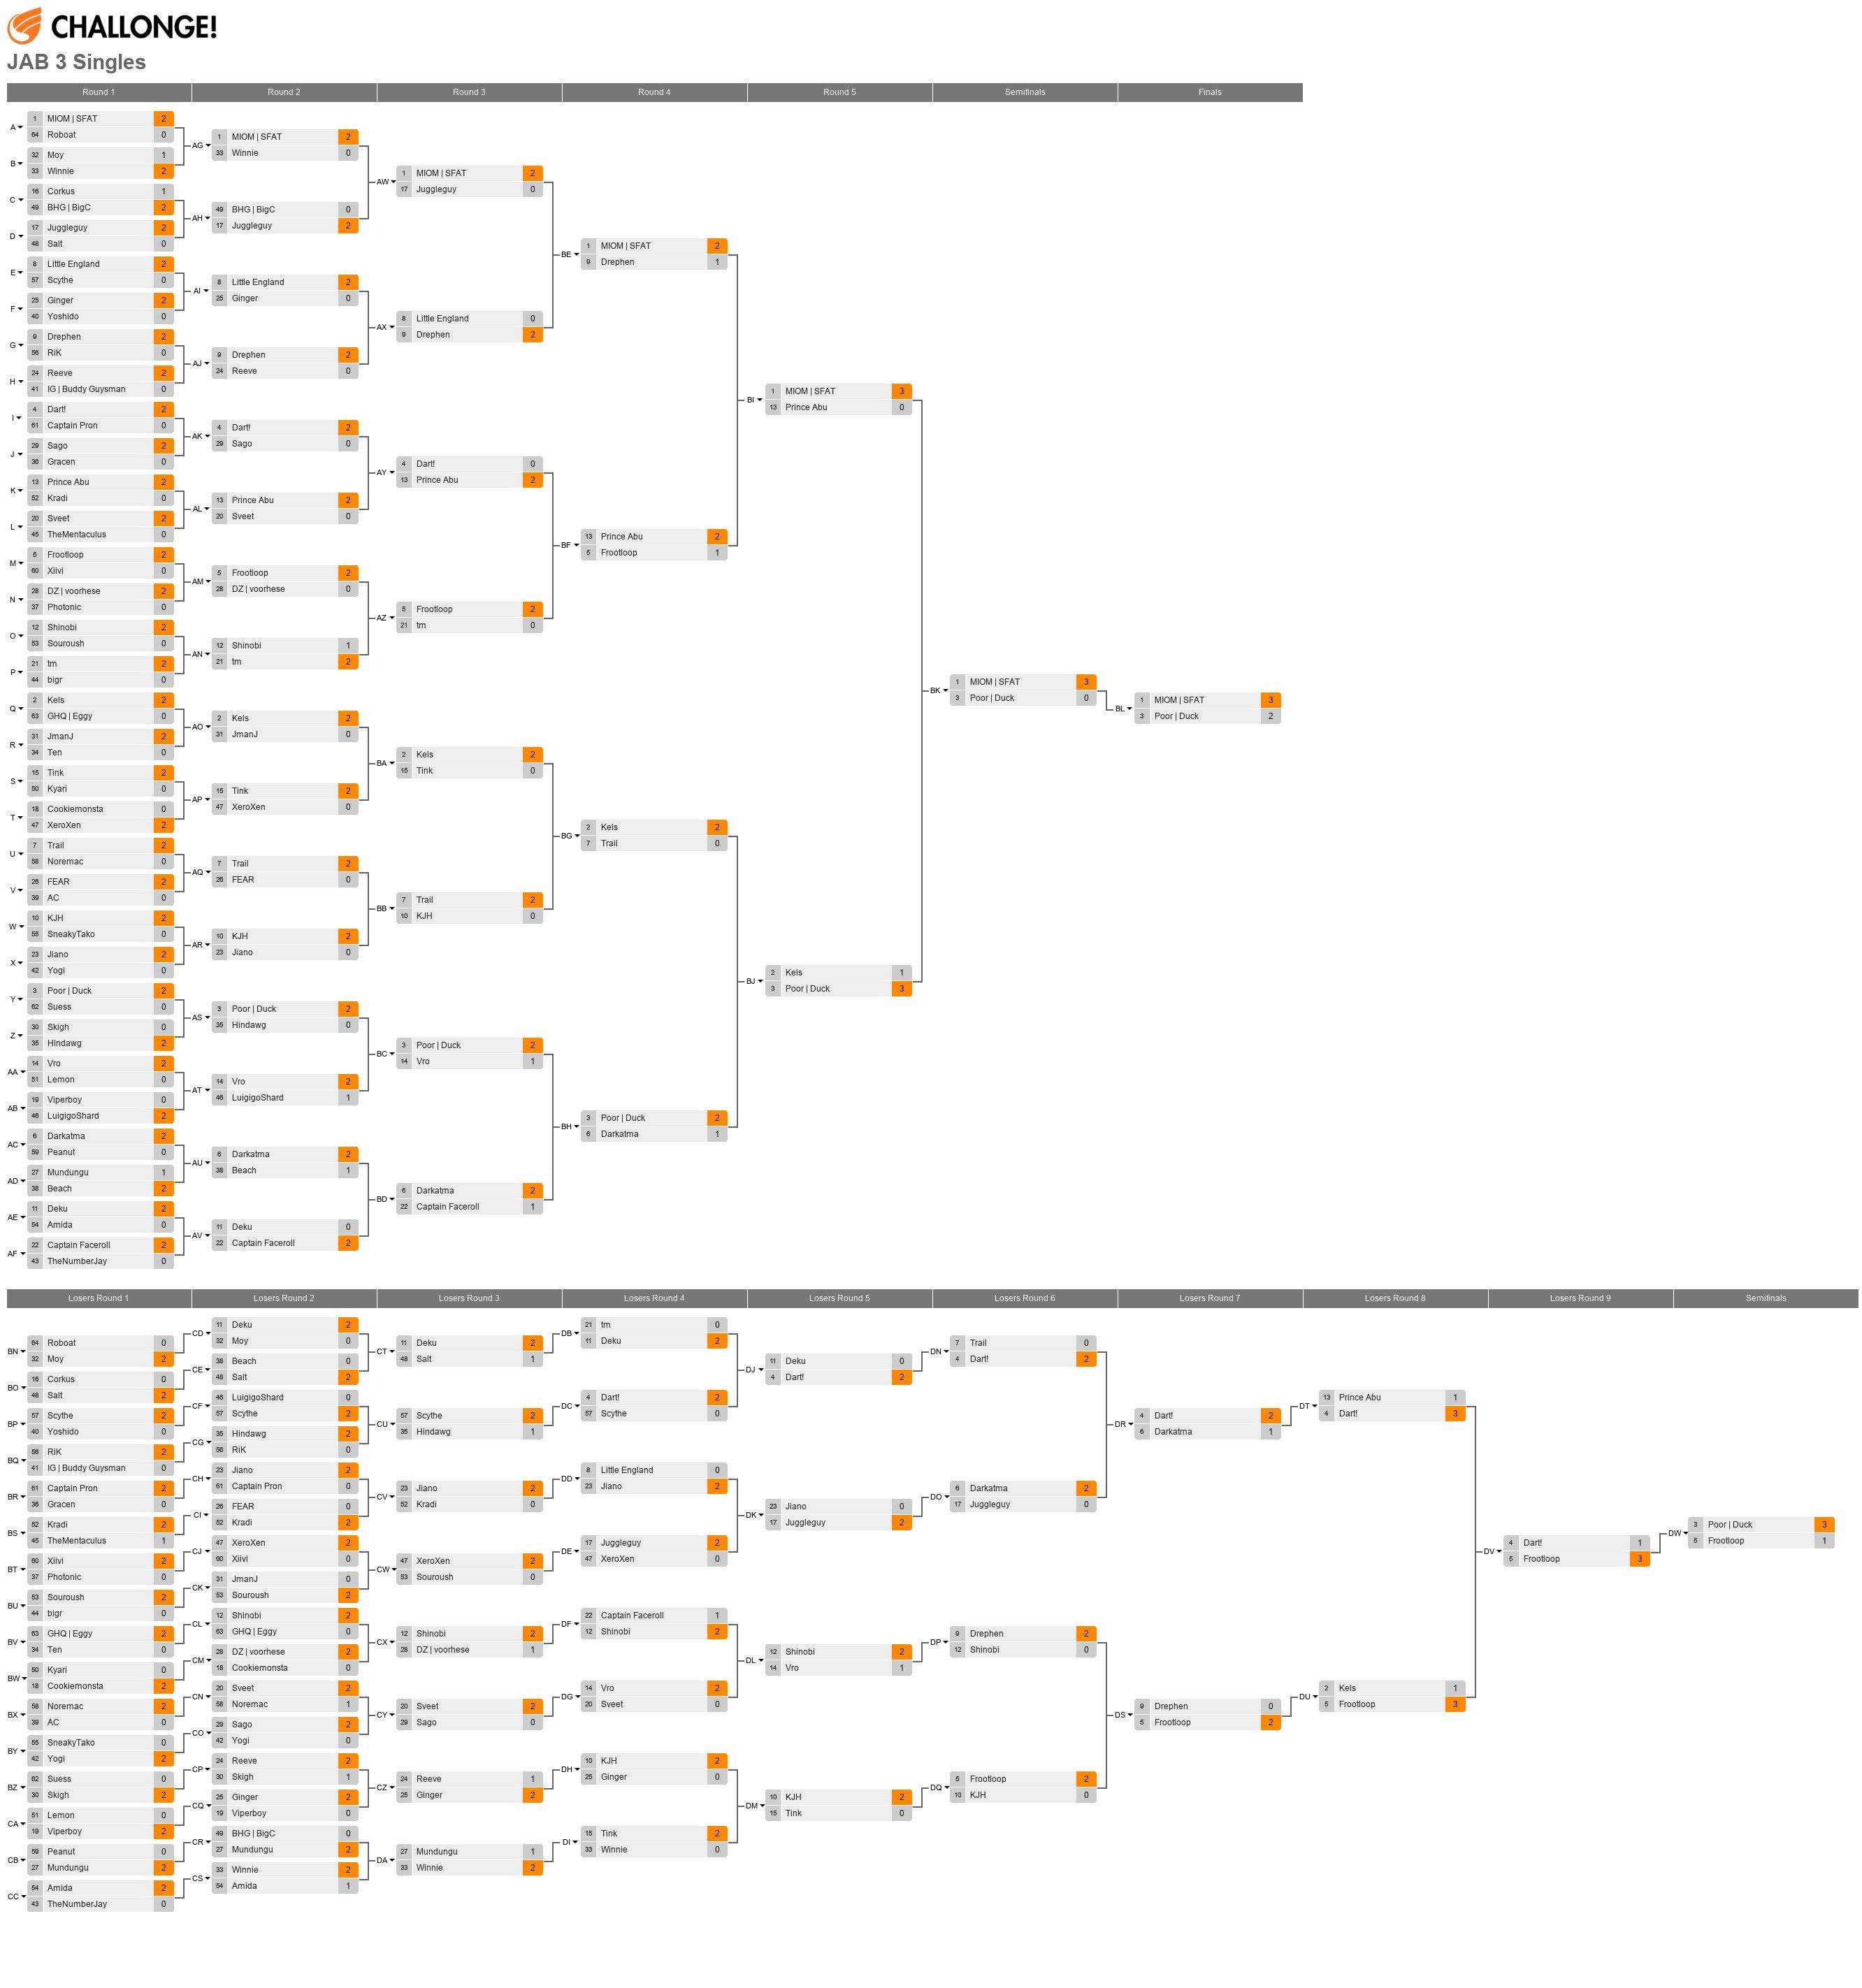 JAB 3 Singles Top 64 (181 entrants)